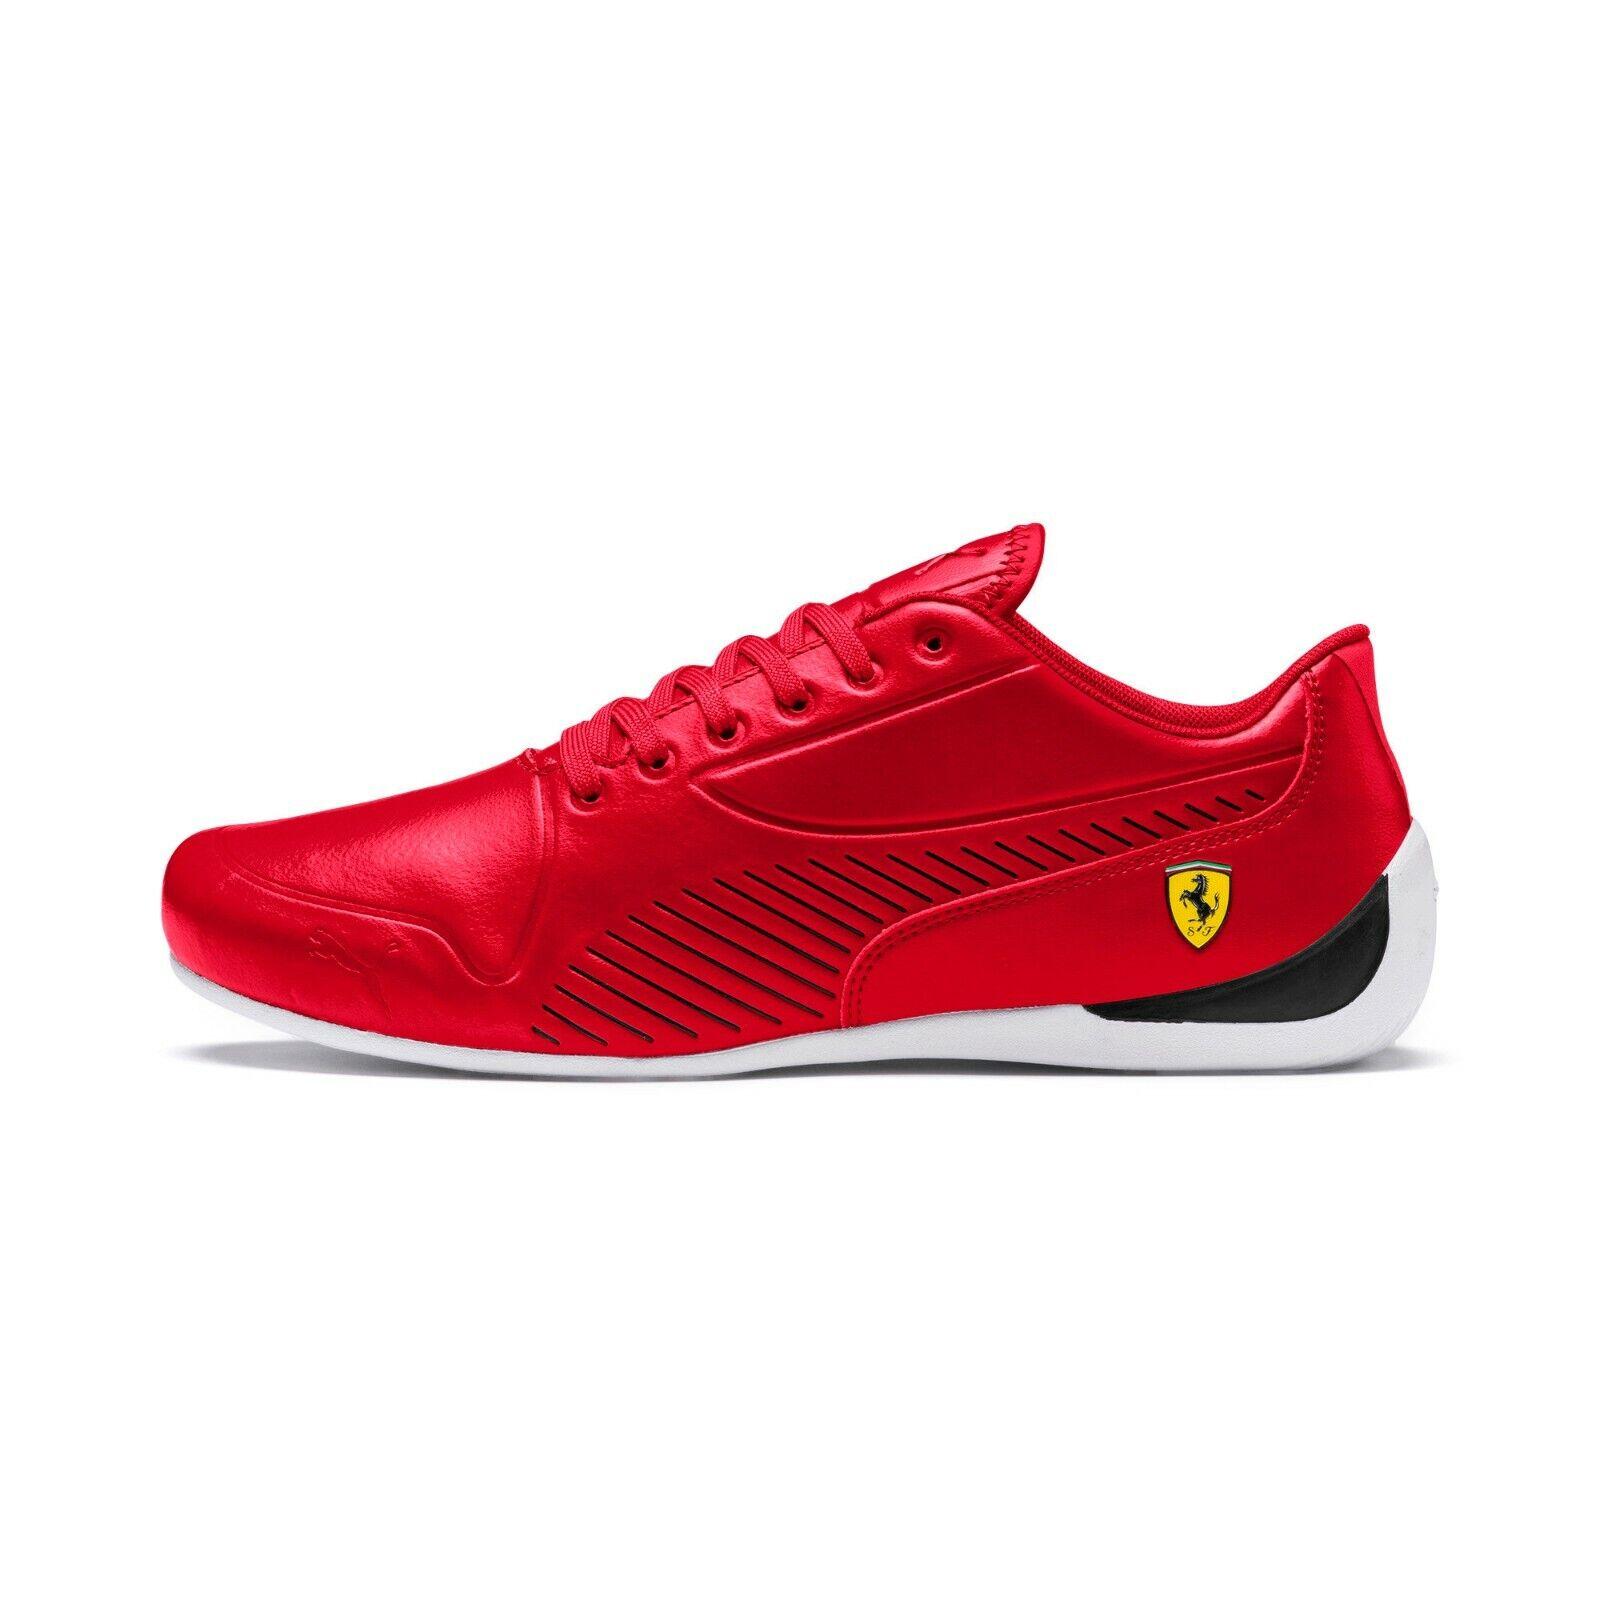 Para Hombre Puma Scuderia Ferrari Drift Cat 7S Ultra Zapatos rojo Corsa negro 306424-03